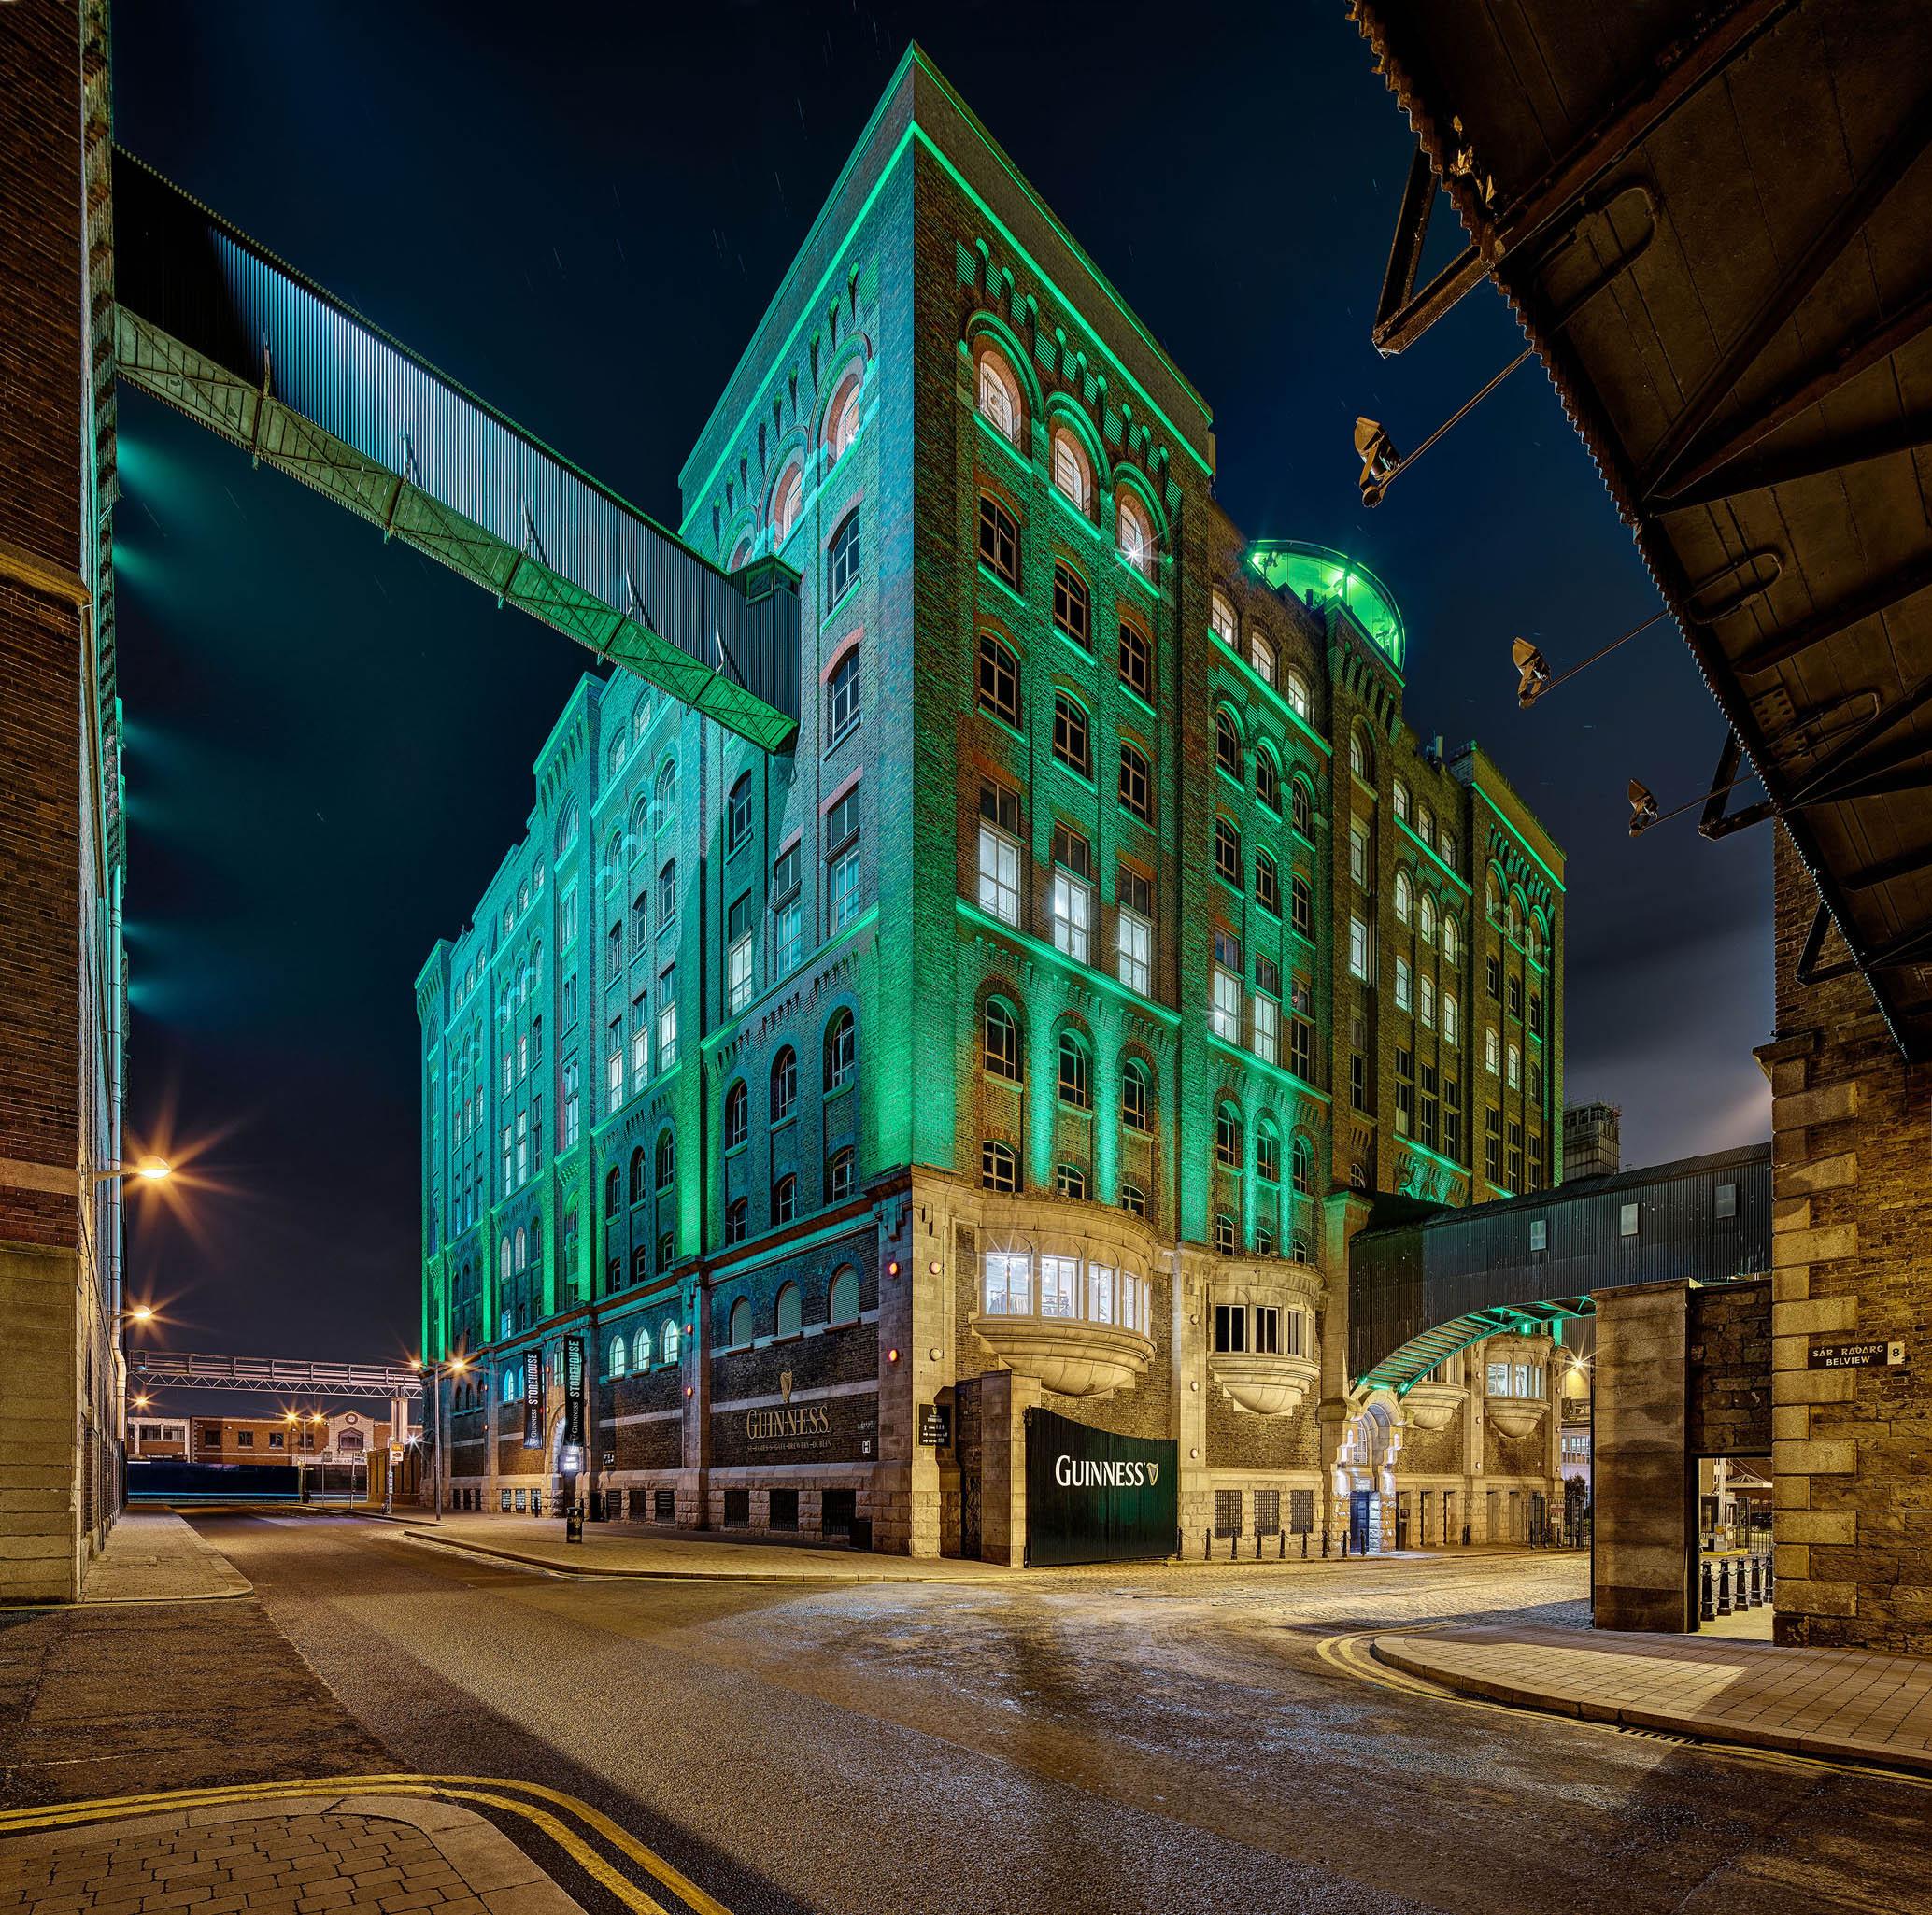 Guinness Storehouse, Guinness Brewery